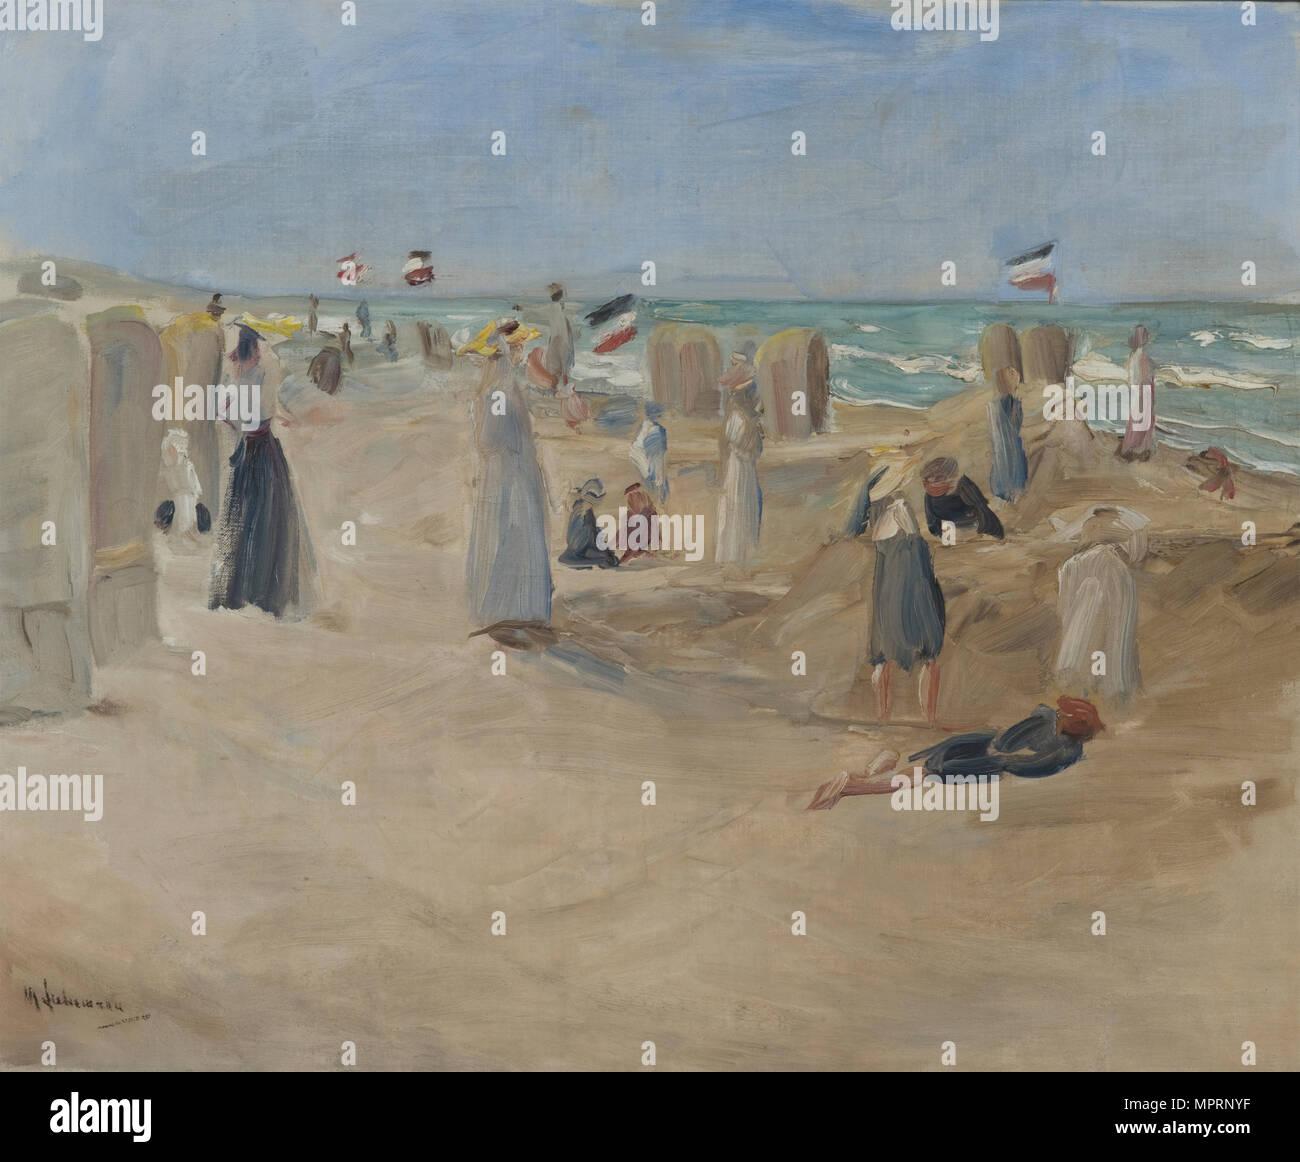 On the beach at Noordwijk, 1908. - Stock Image